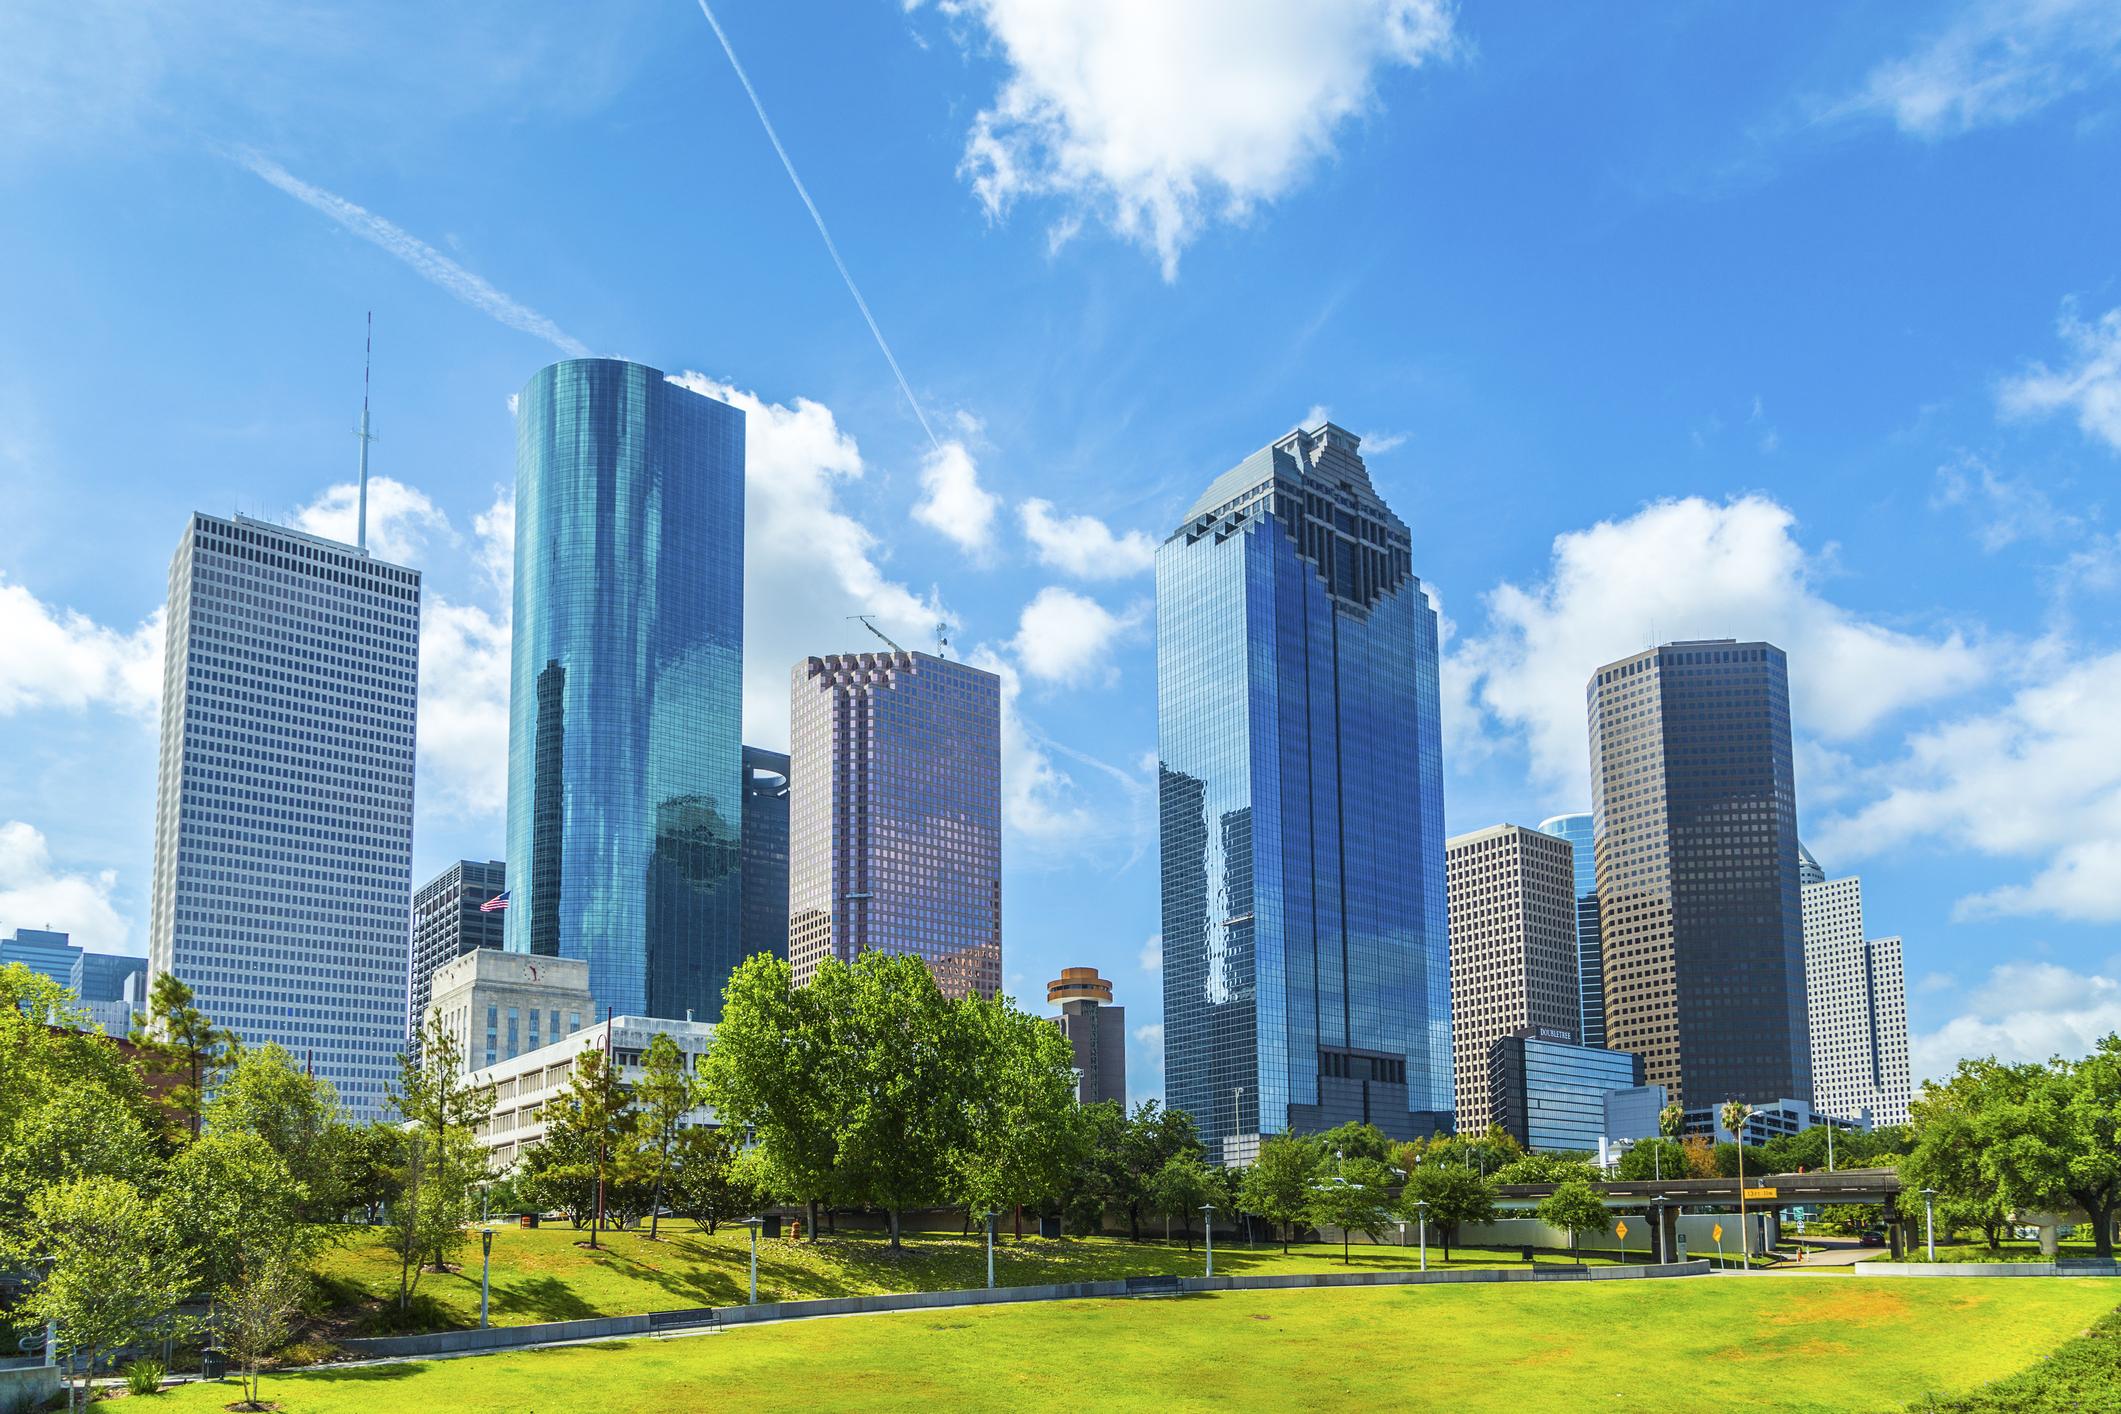 Skyline of Houston, Texas in daytime under blue sky